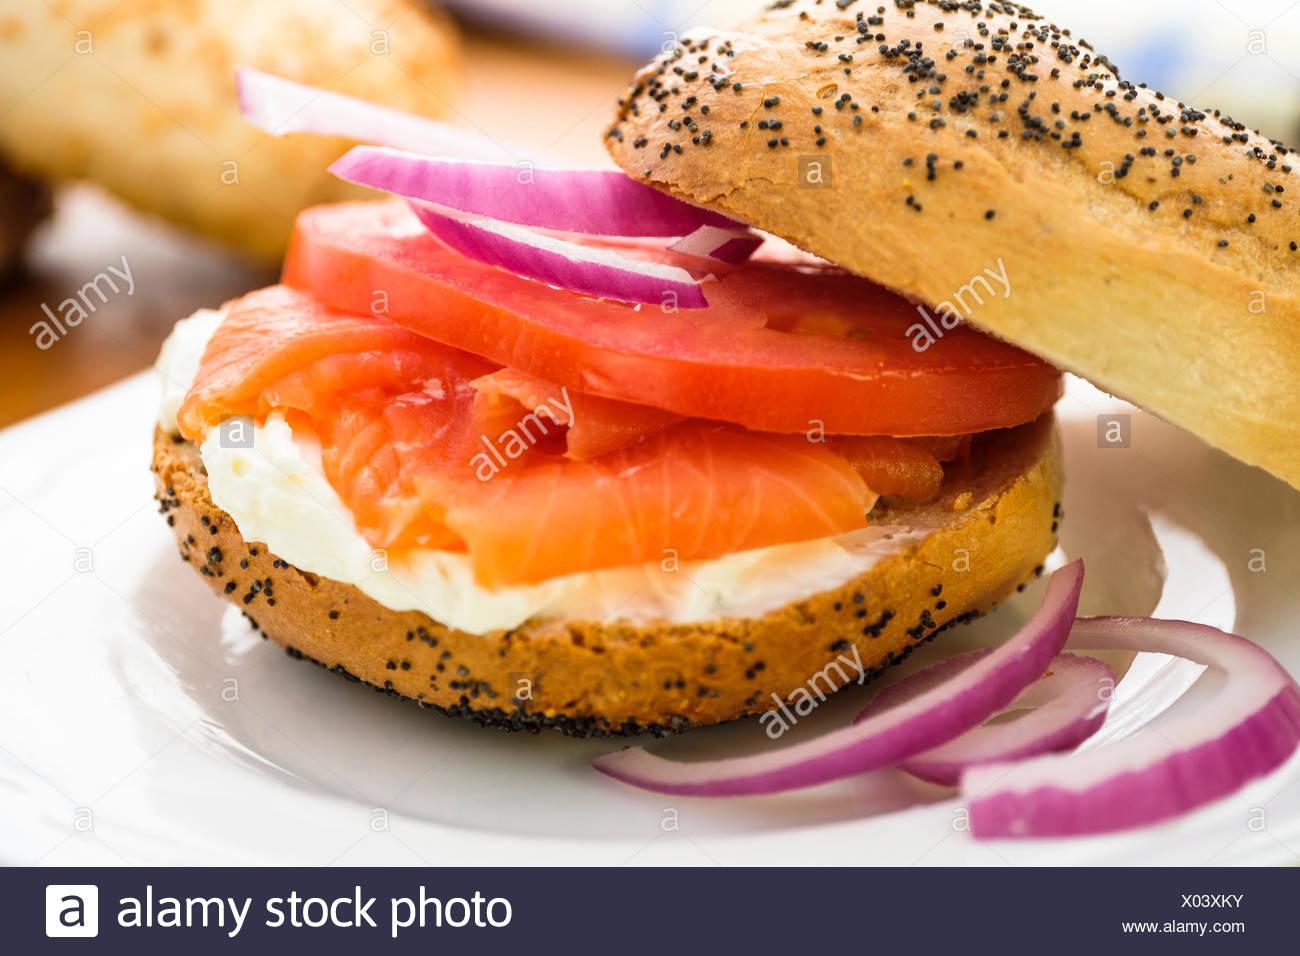 Nova Scotia salmón también llamado Nova lox Imagen De Stock